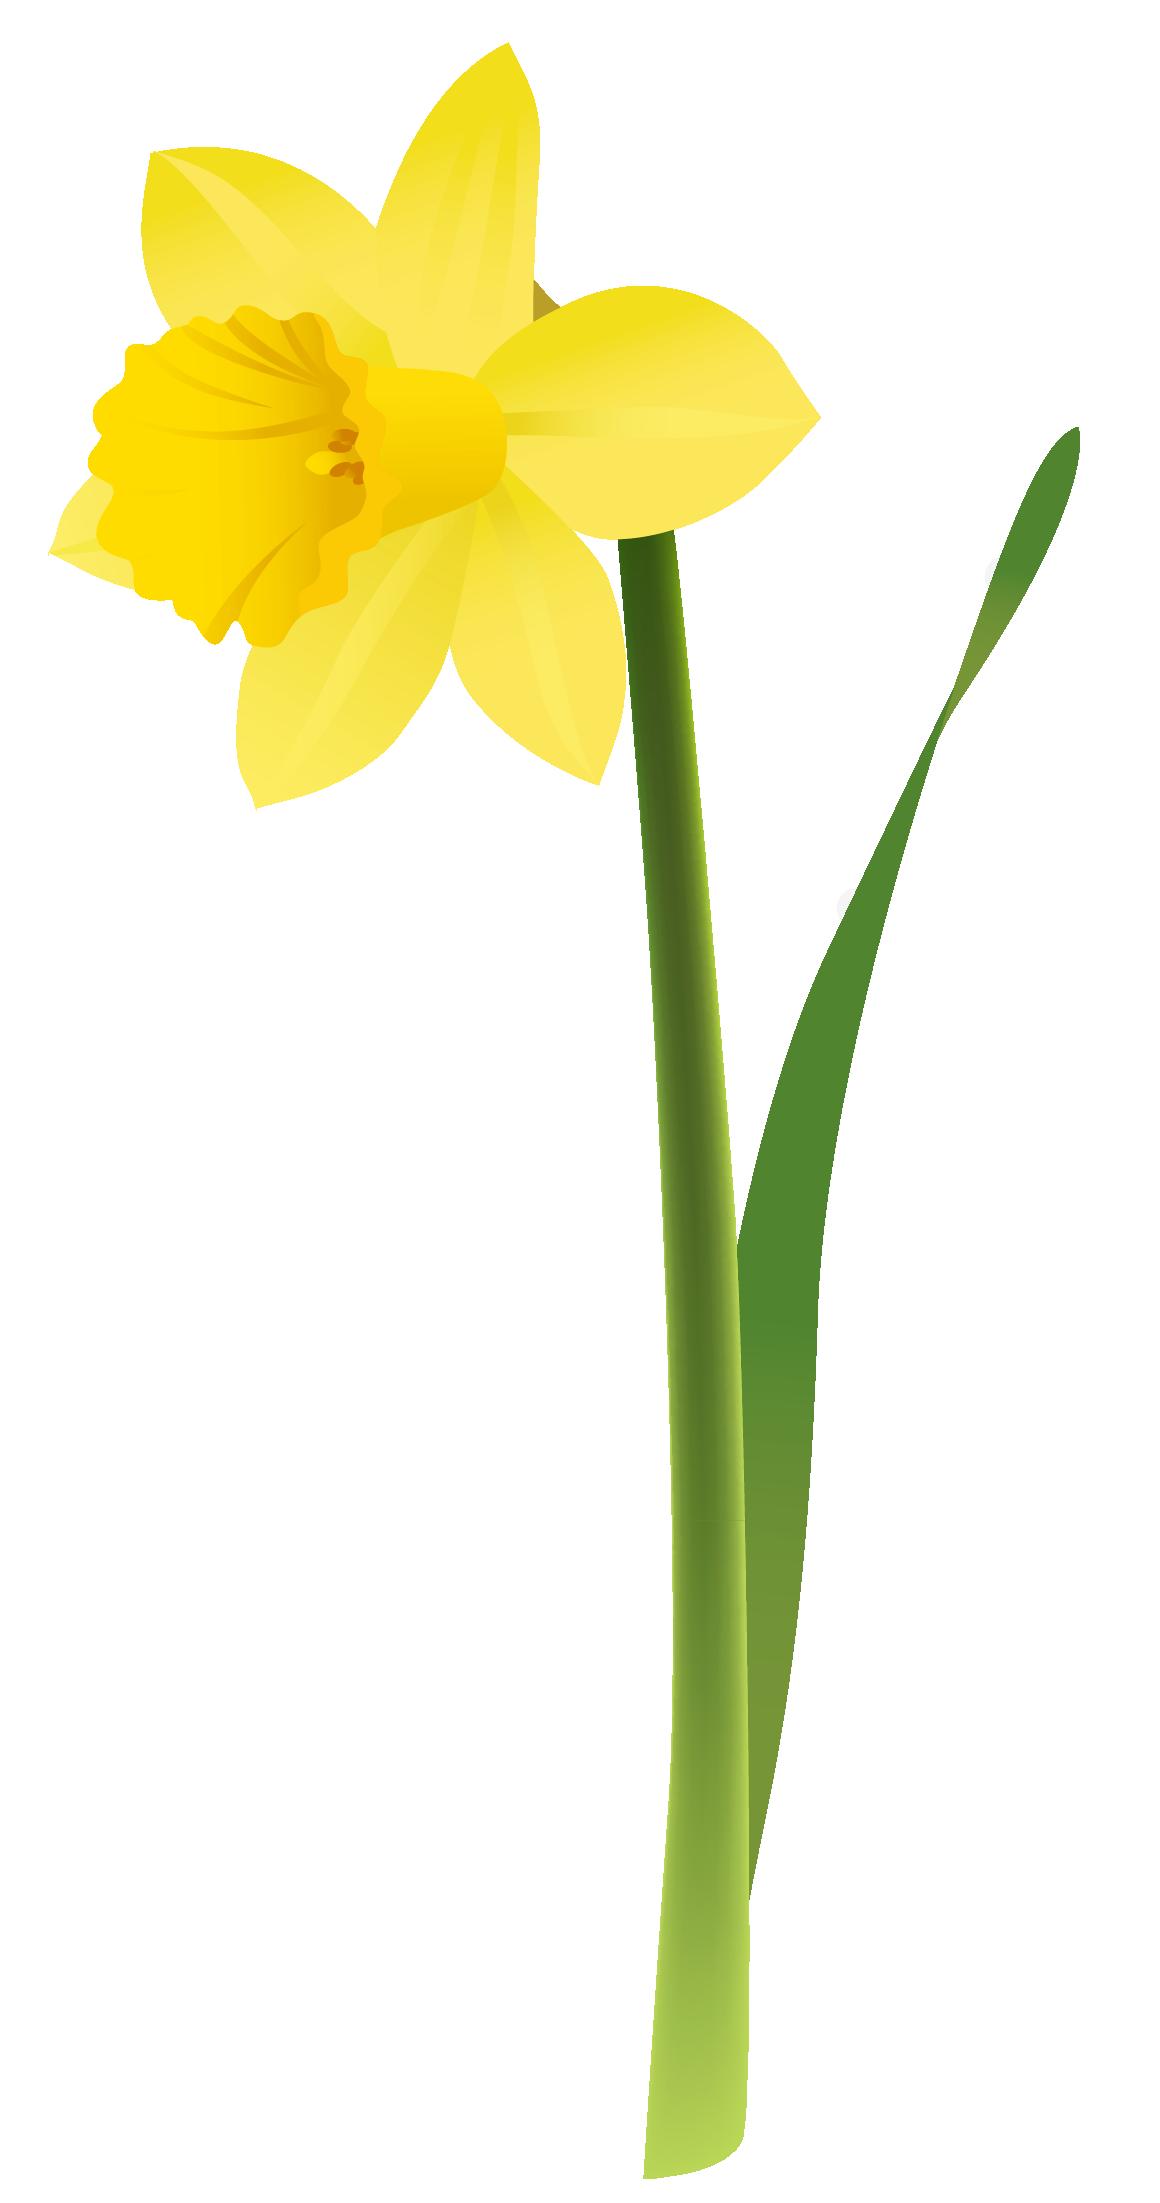 Gate clipart spring garden. Yellow daffodils gratitude pinterest